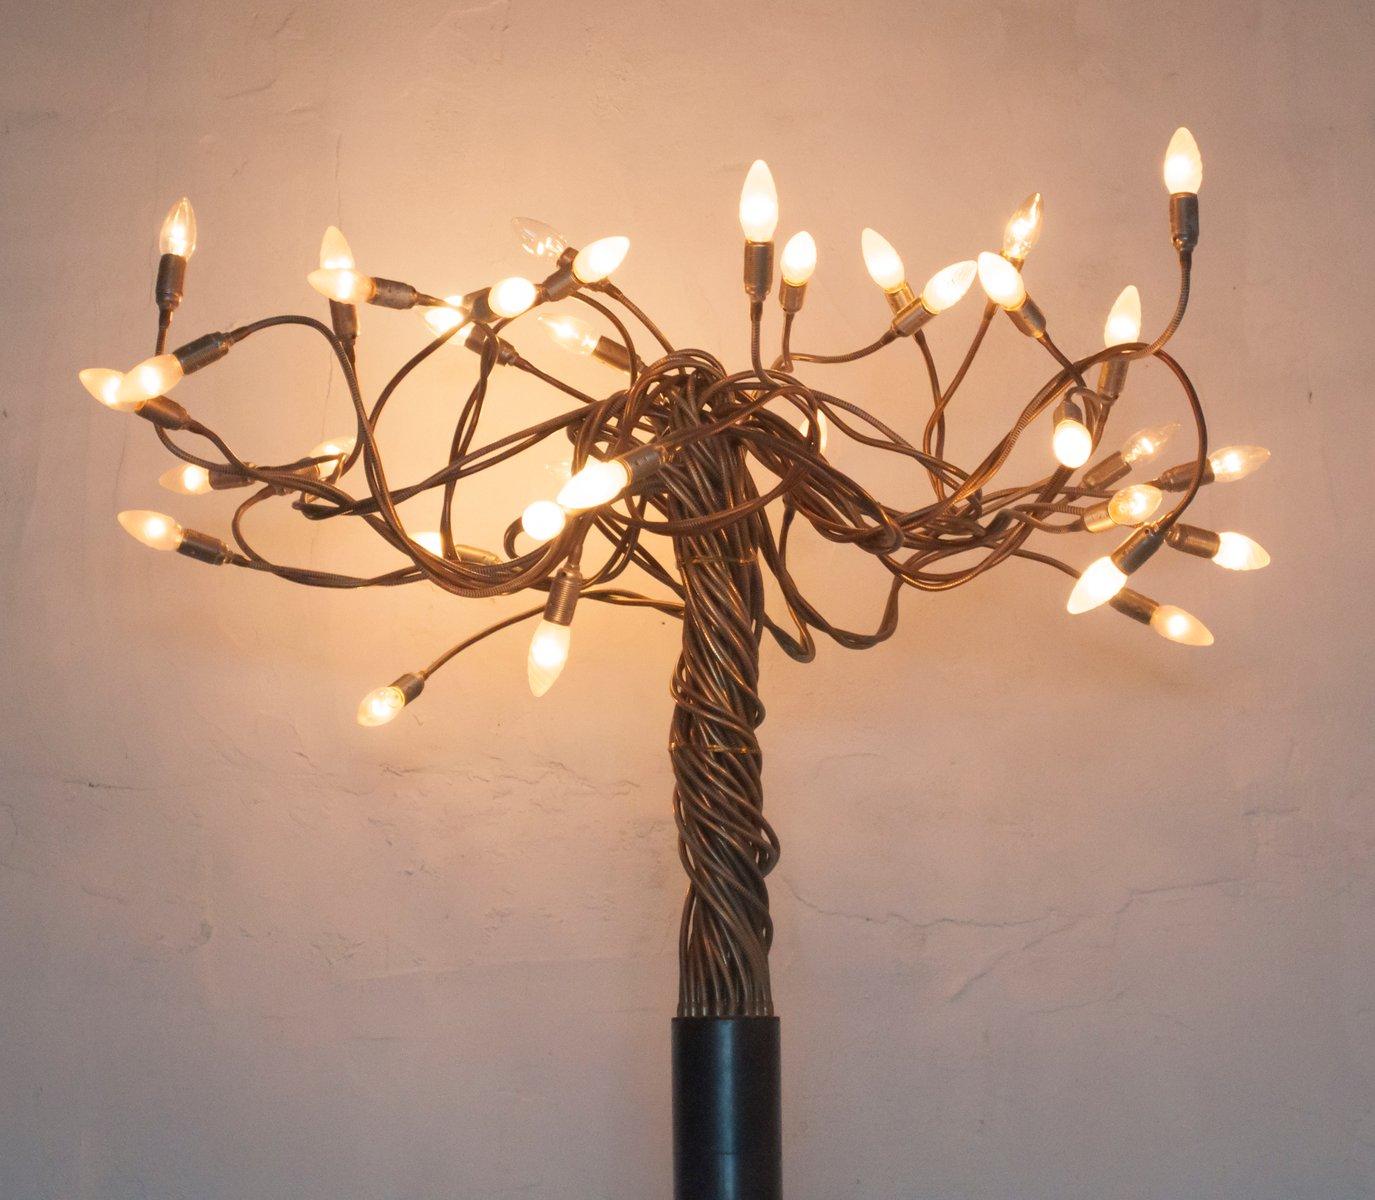 Vintage Tree of Light Stehlampe von Catellani & Smith bei Pamono kaufen